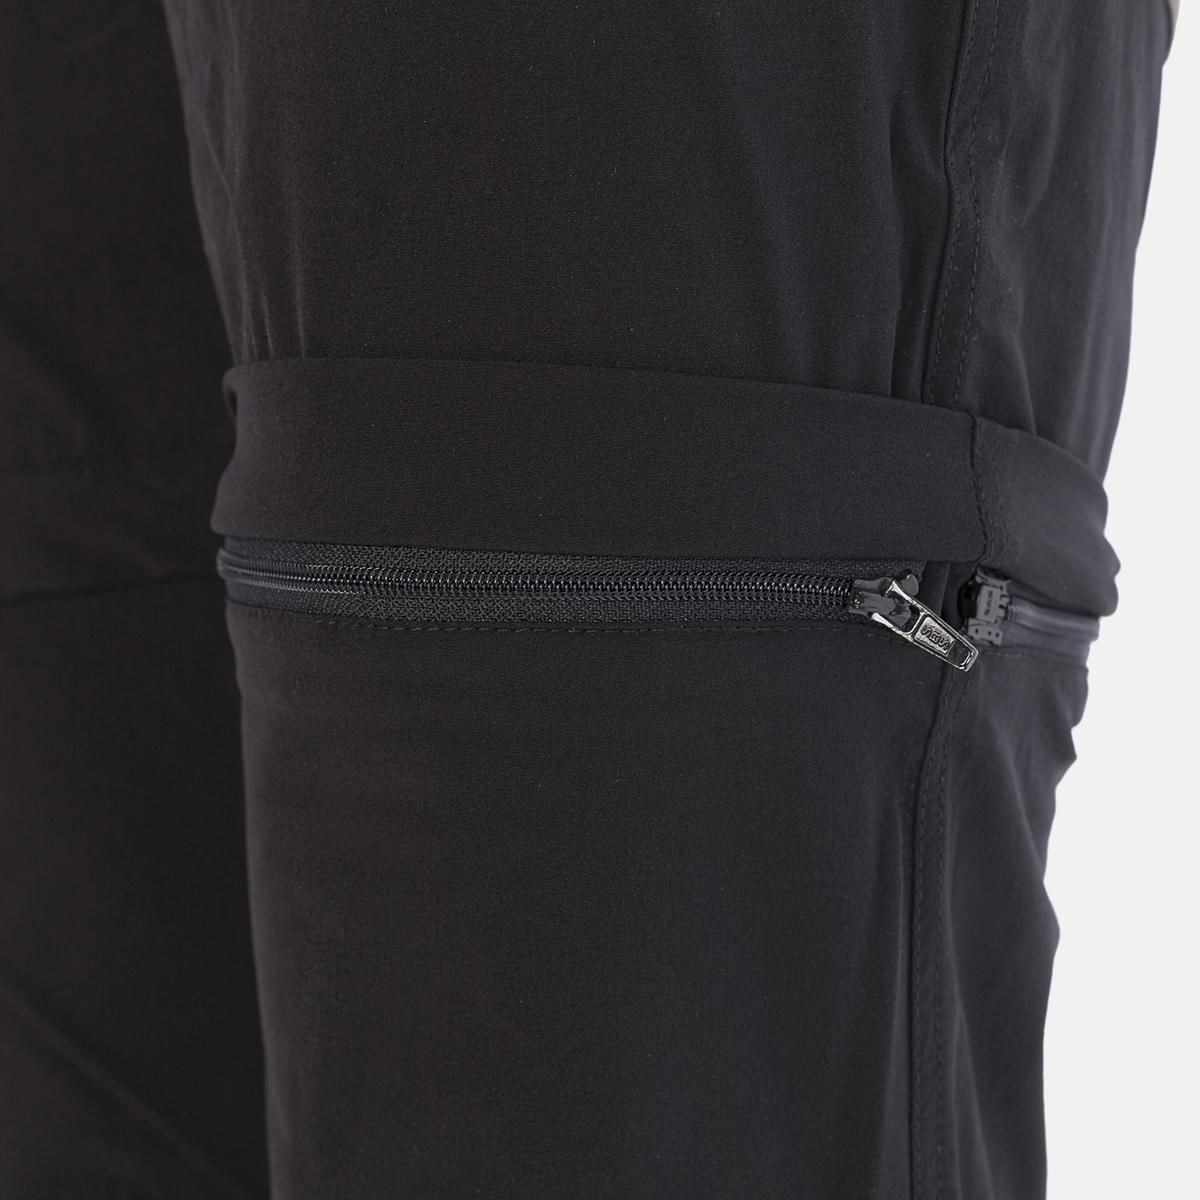 MAN'S KOBUK STRETCH PANT, DETACHABLE BLACK